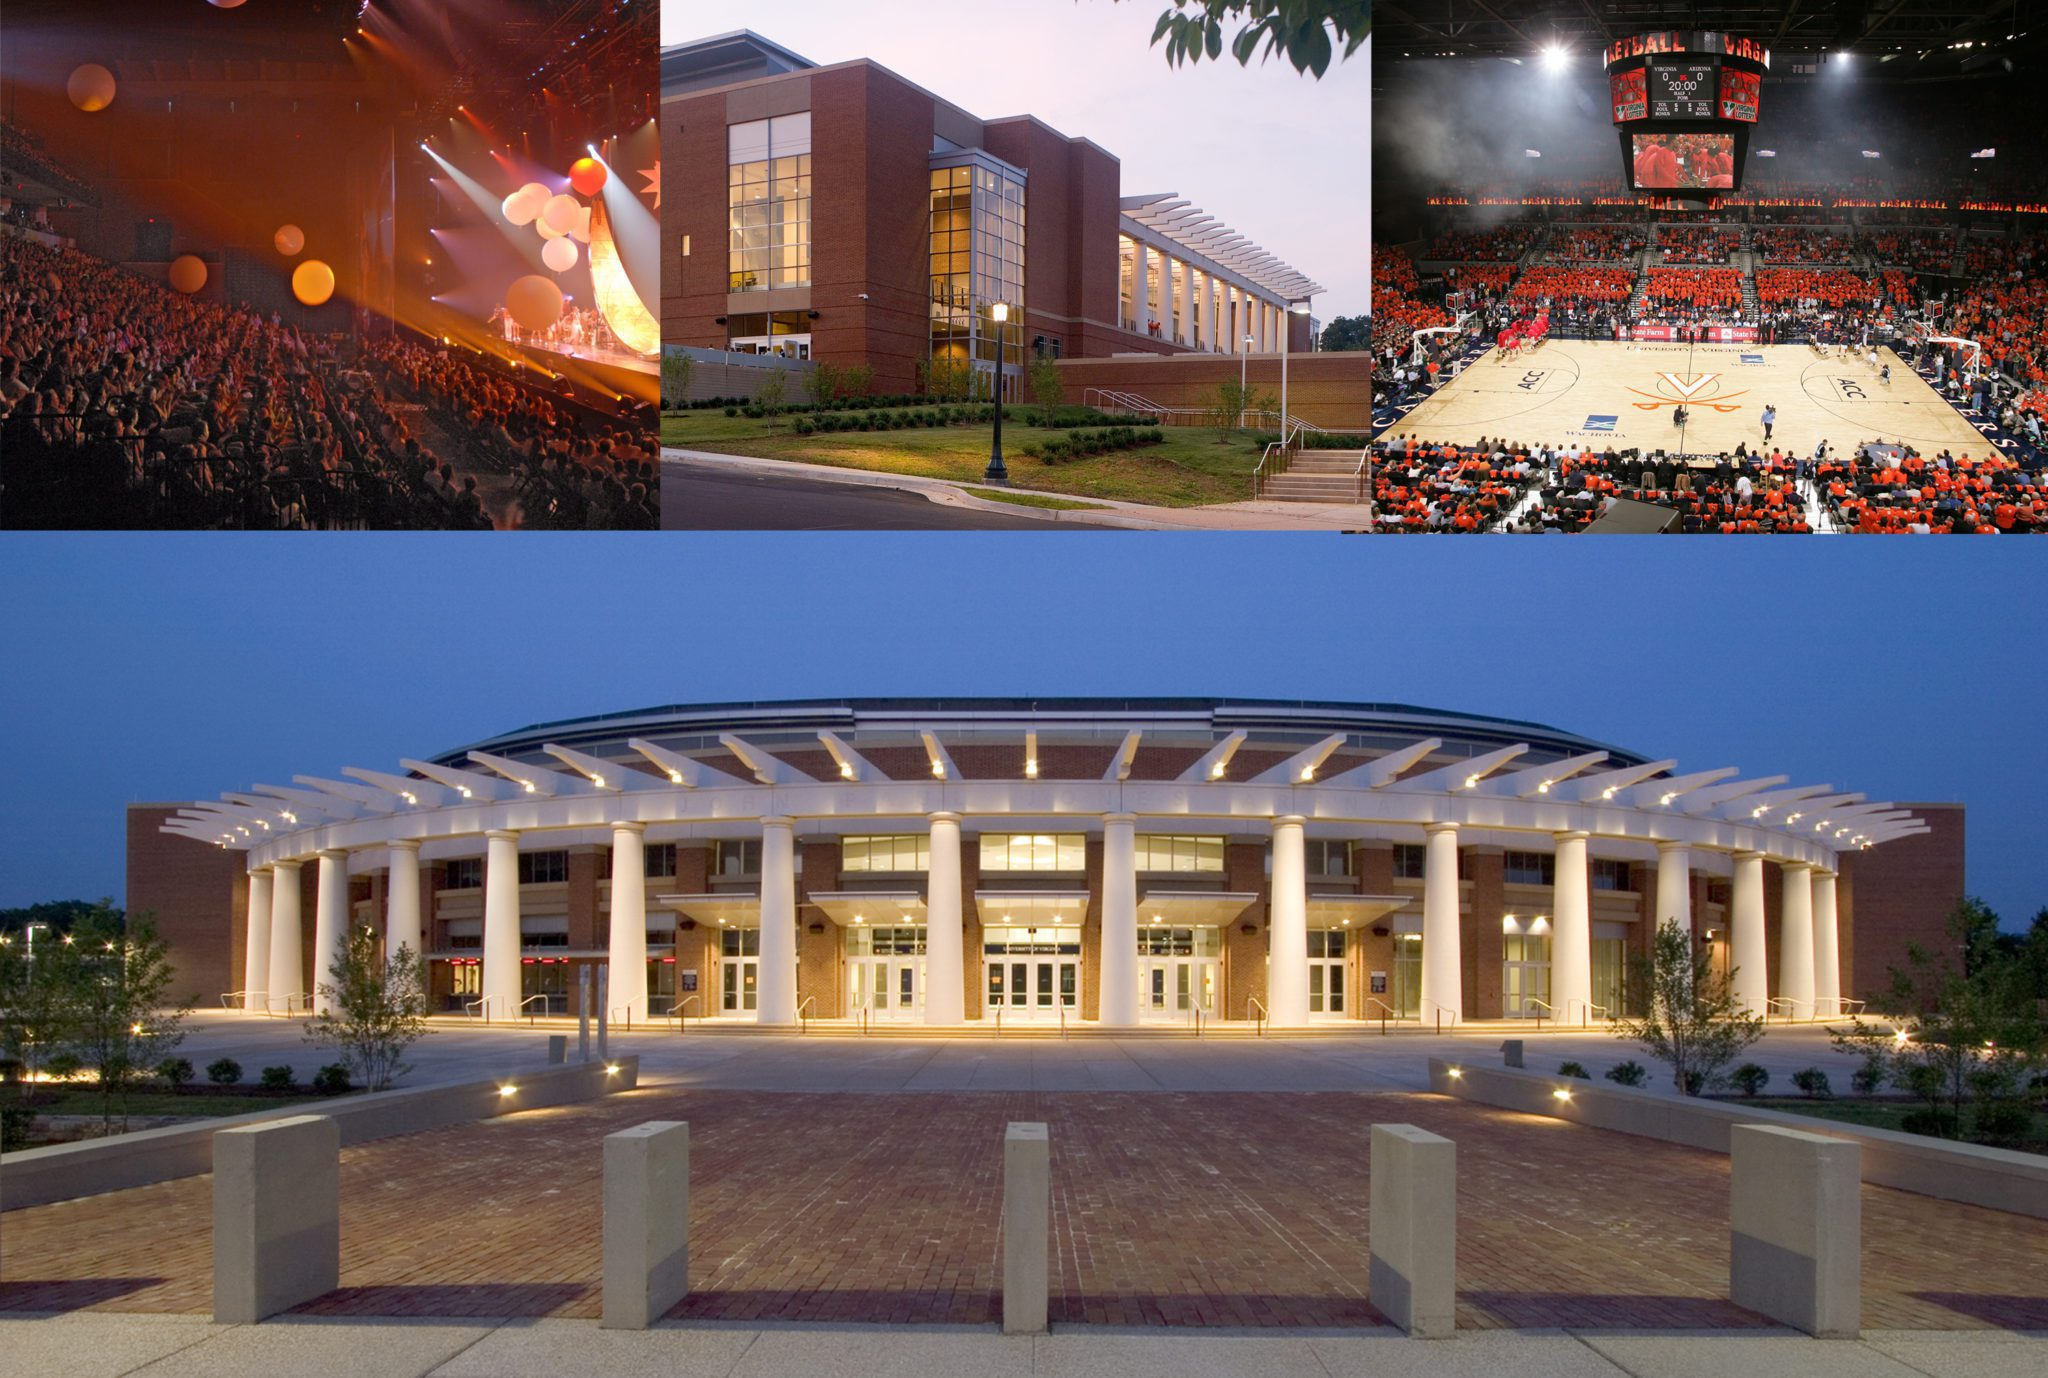 John Paul Johns Arena